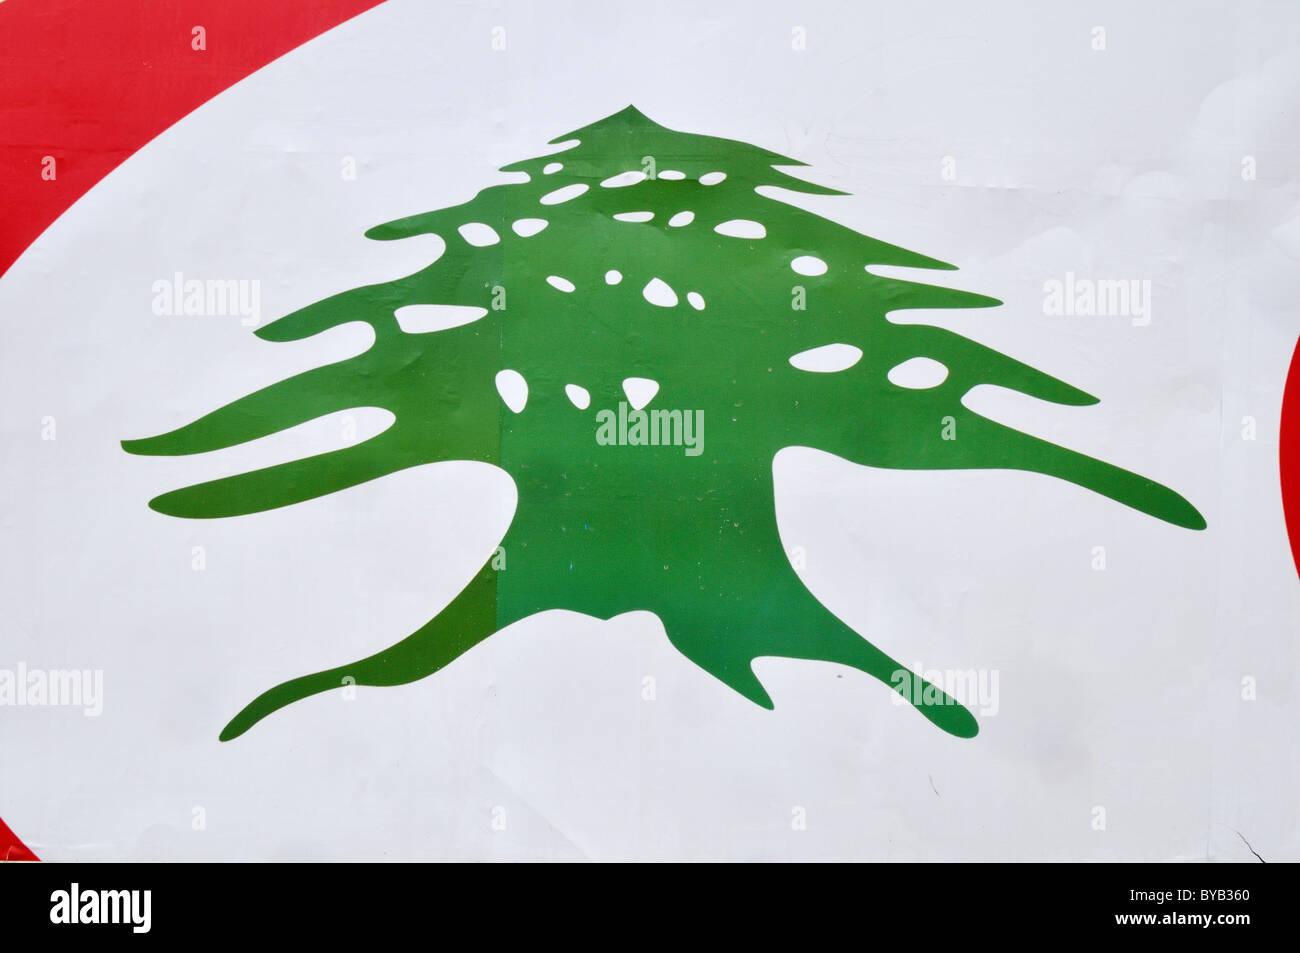 Cedar Tree Logo, Lebanon, Middle East, West Asia Stock Photo